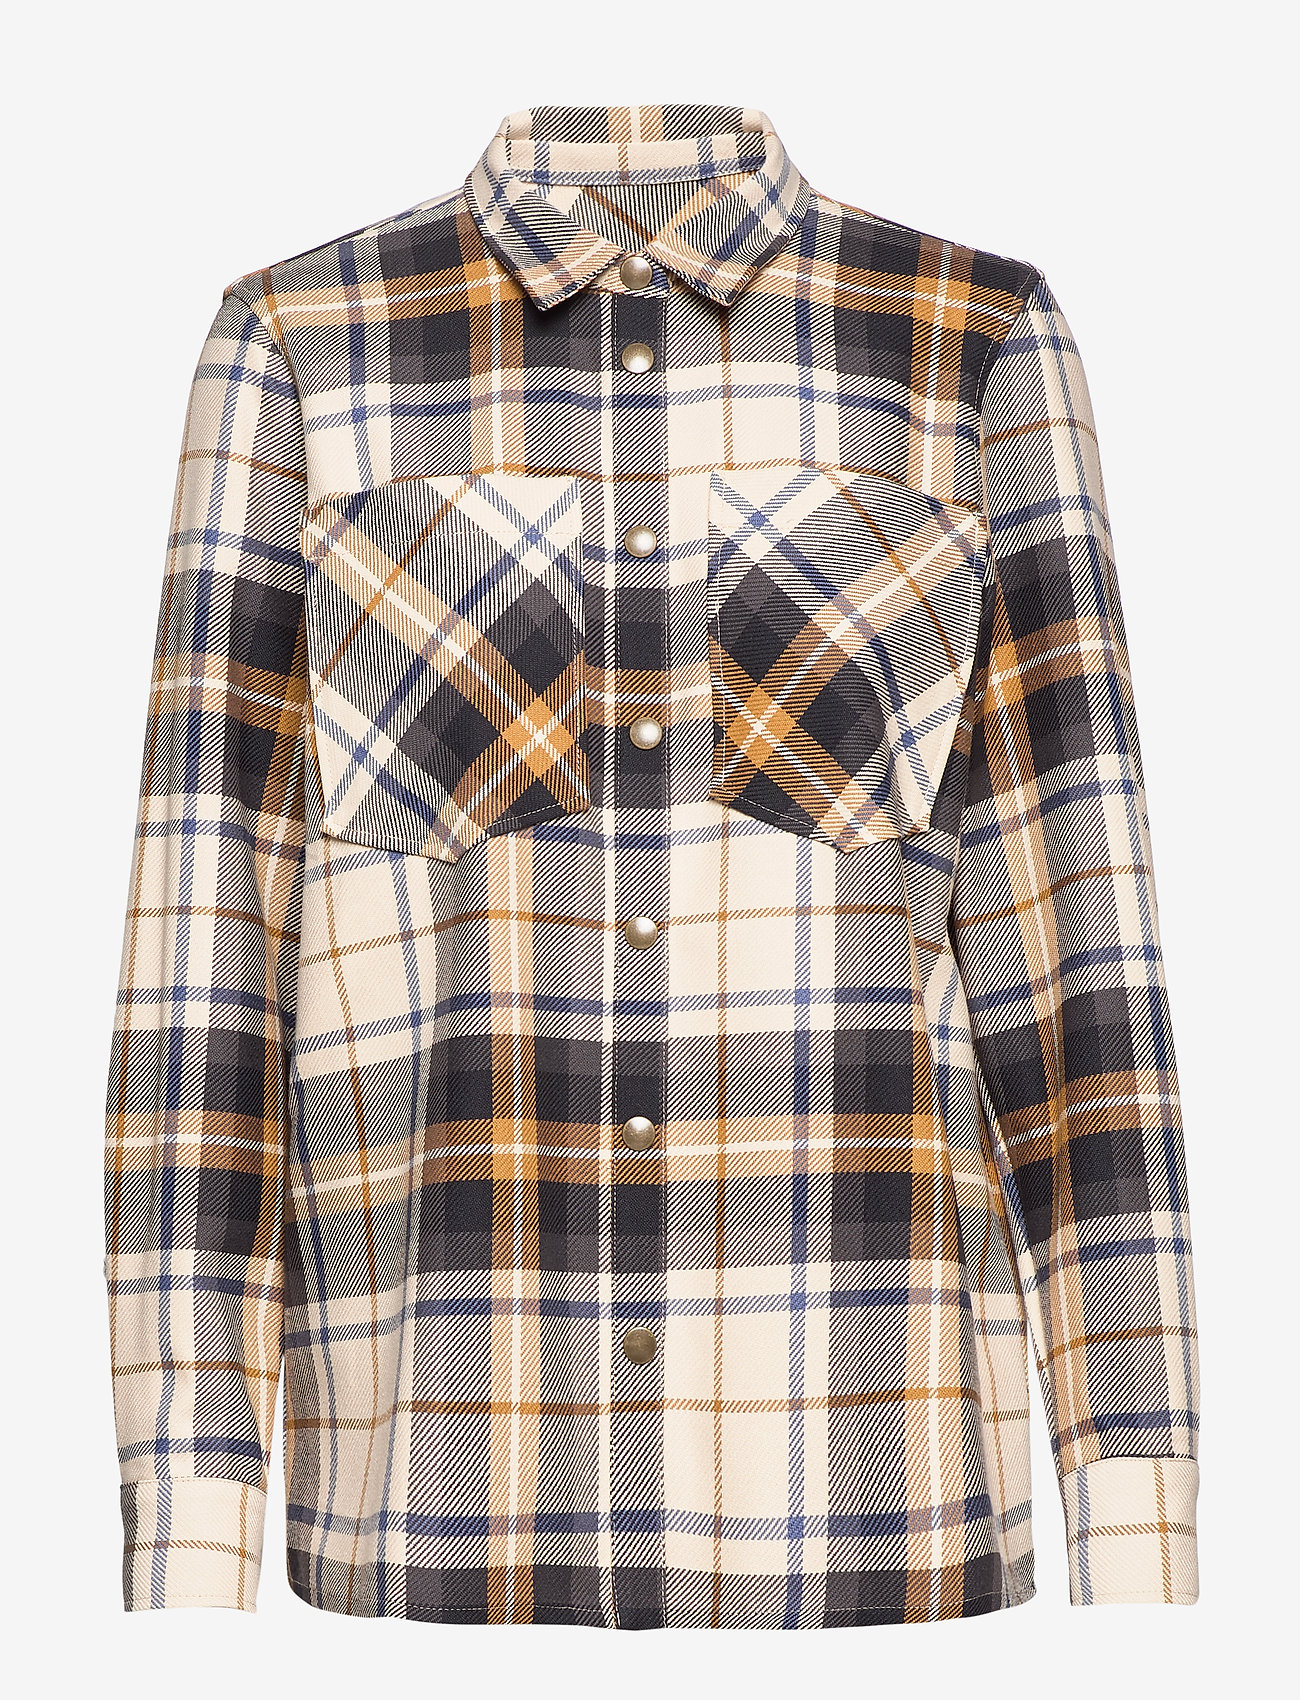 IBEN - Fabian Shirt STG - pitkähihaiset paidat - moonlight